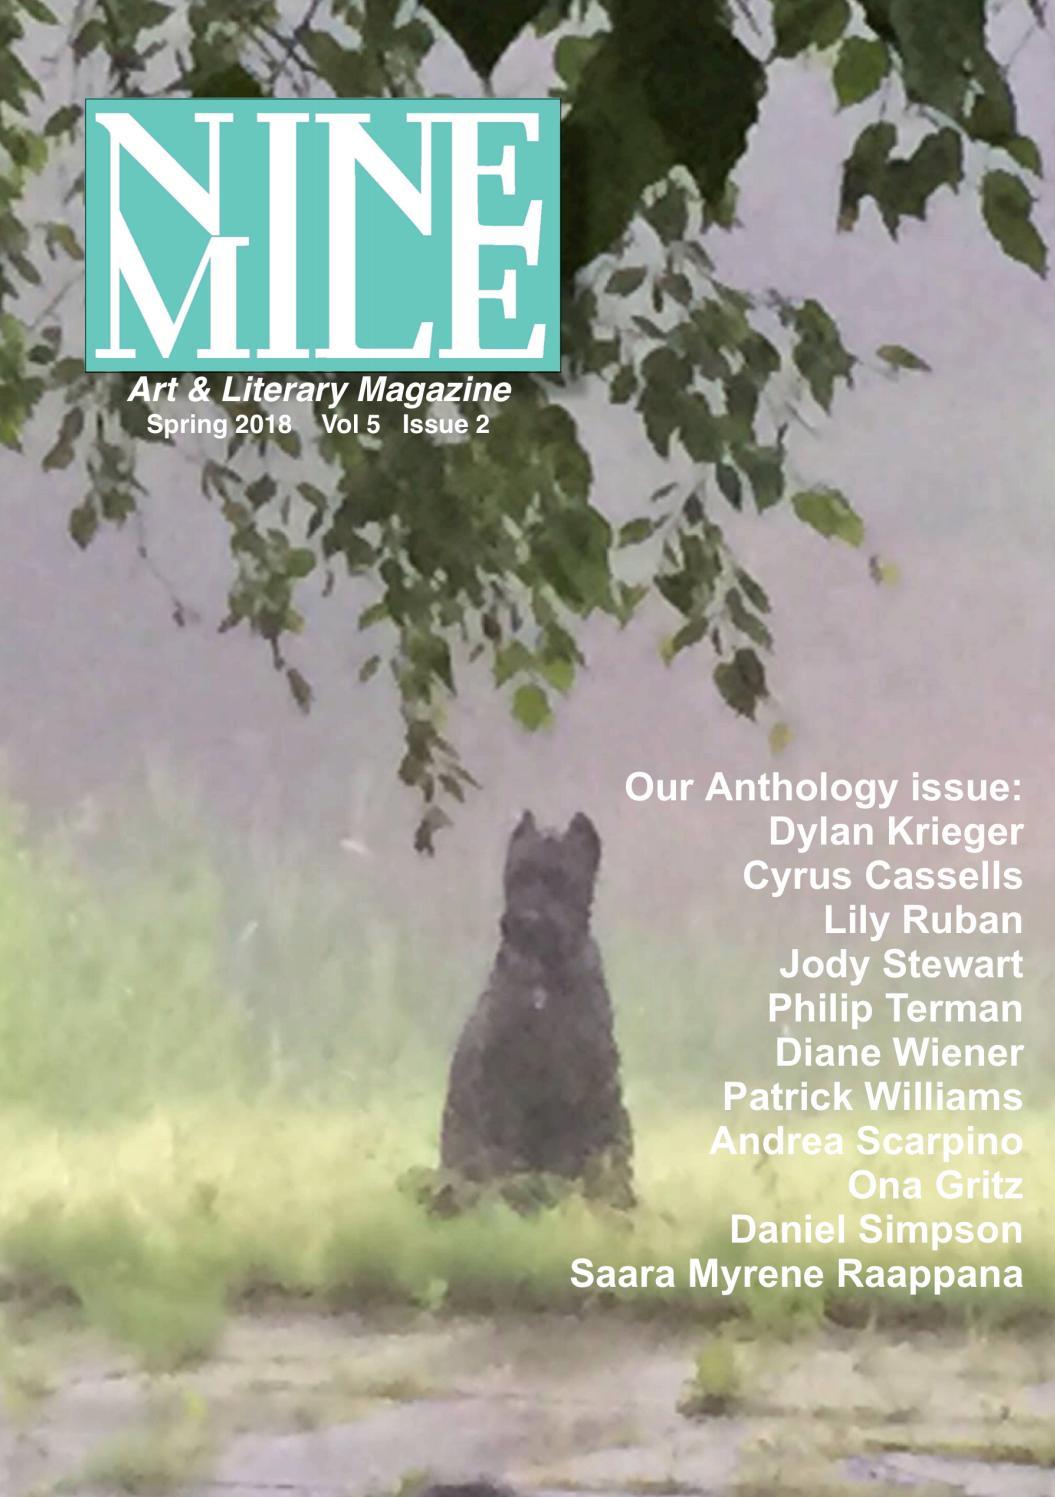 Nine Mile Magazine Spring 2018 by Bob Herz - issuu